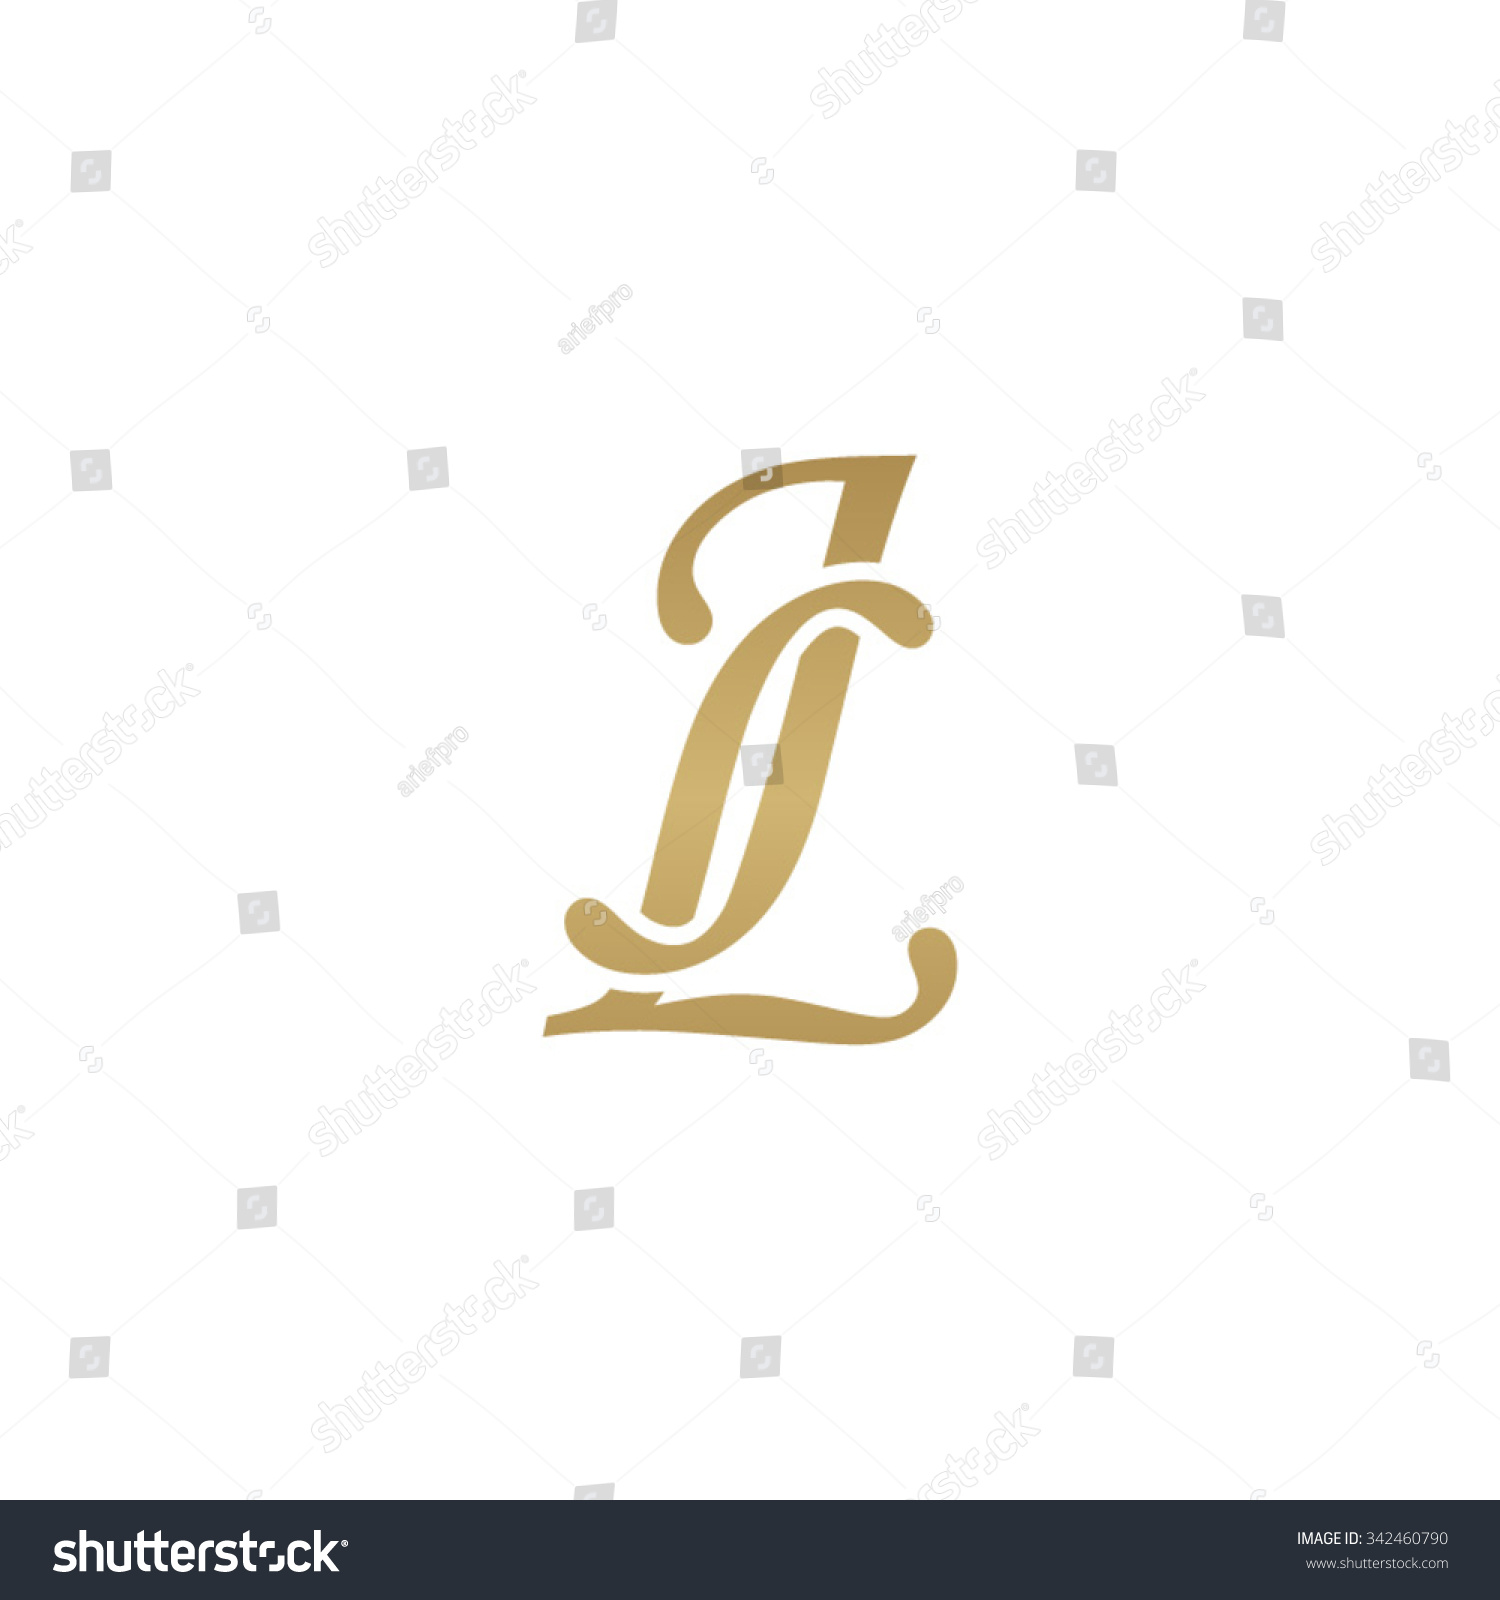 Jl Initial Monogram Logo Stock Vector 342460790 - Shutterstock